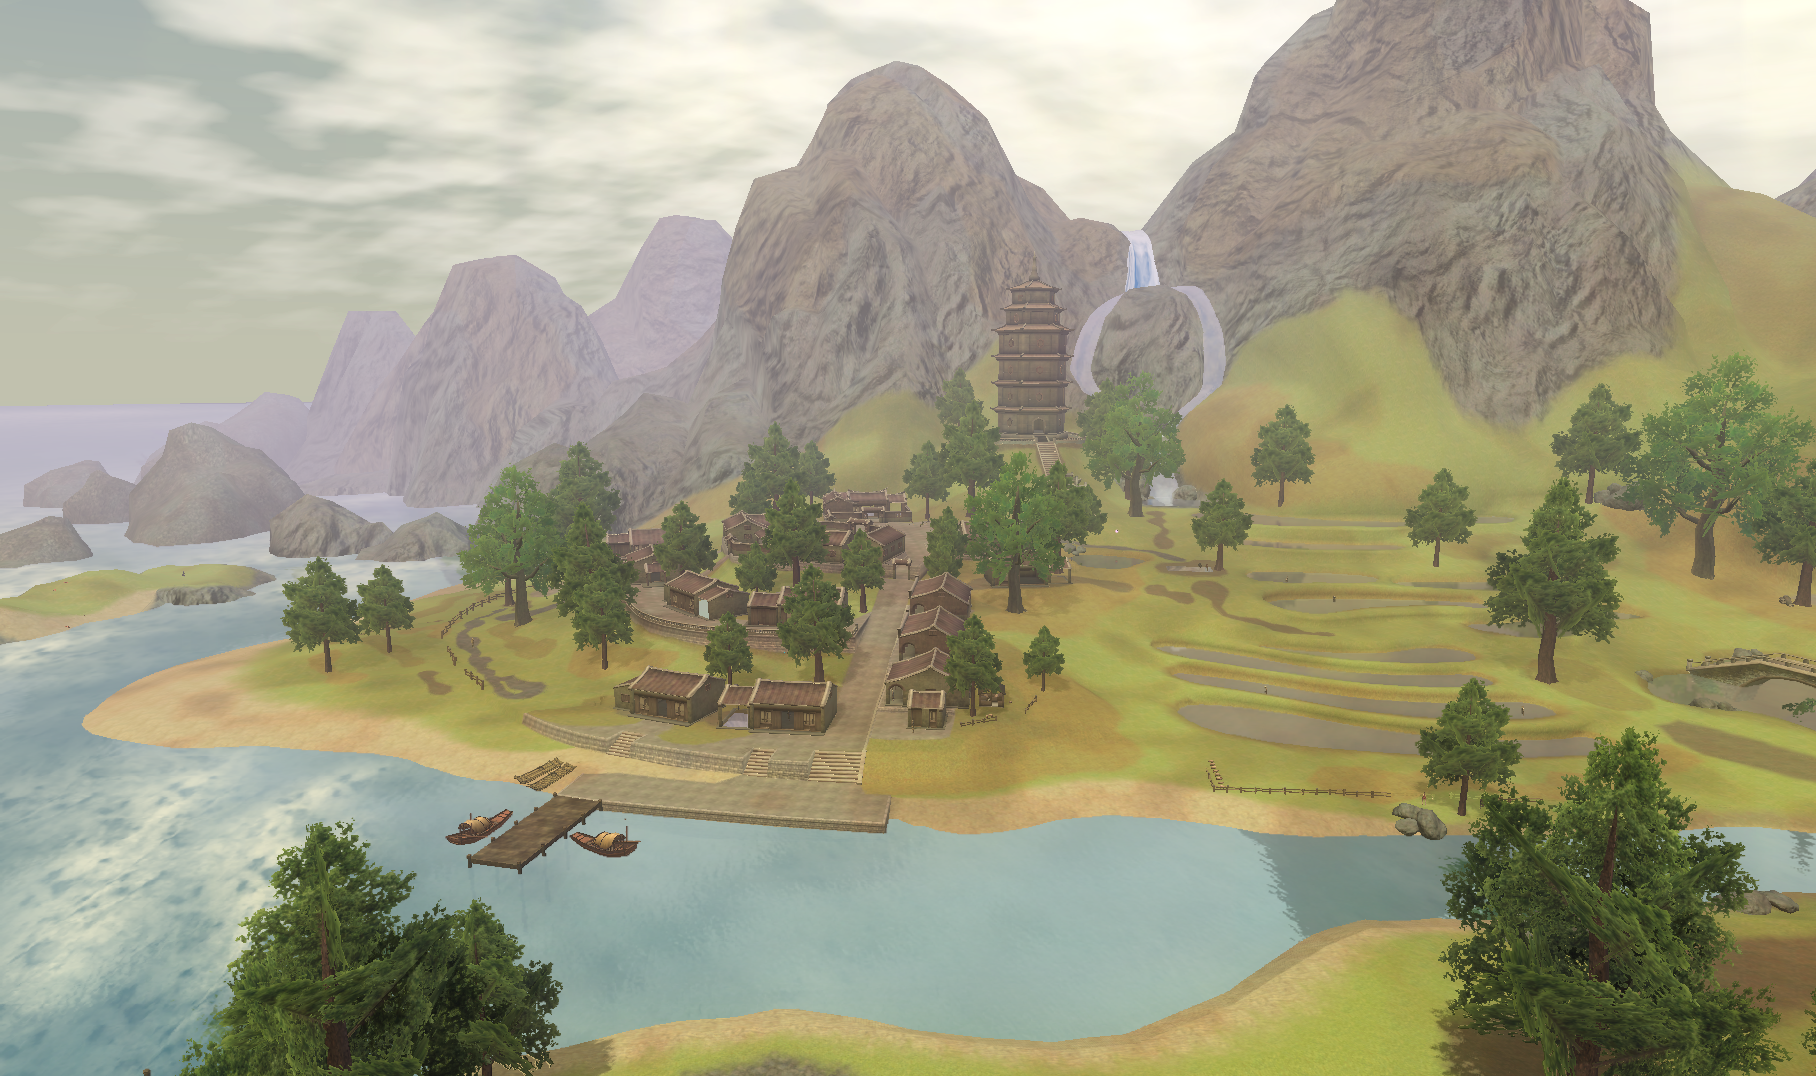 The Village of Shin